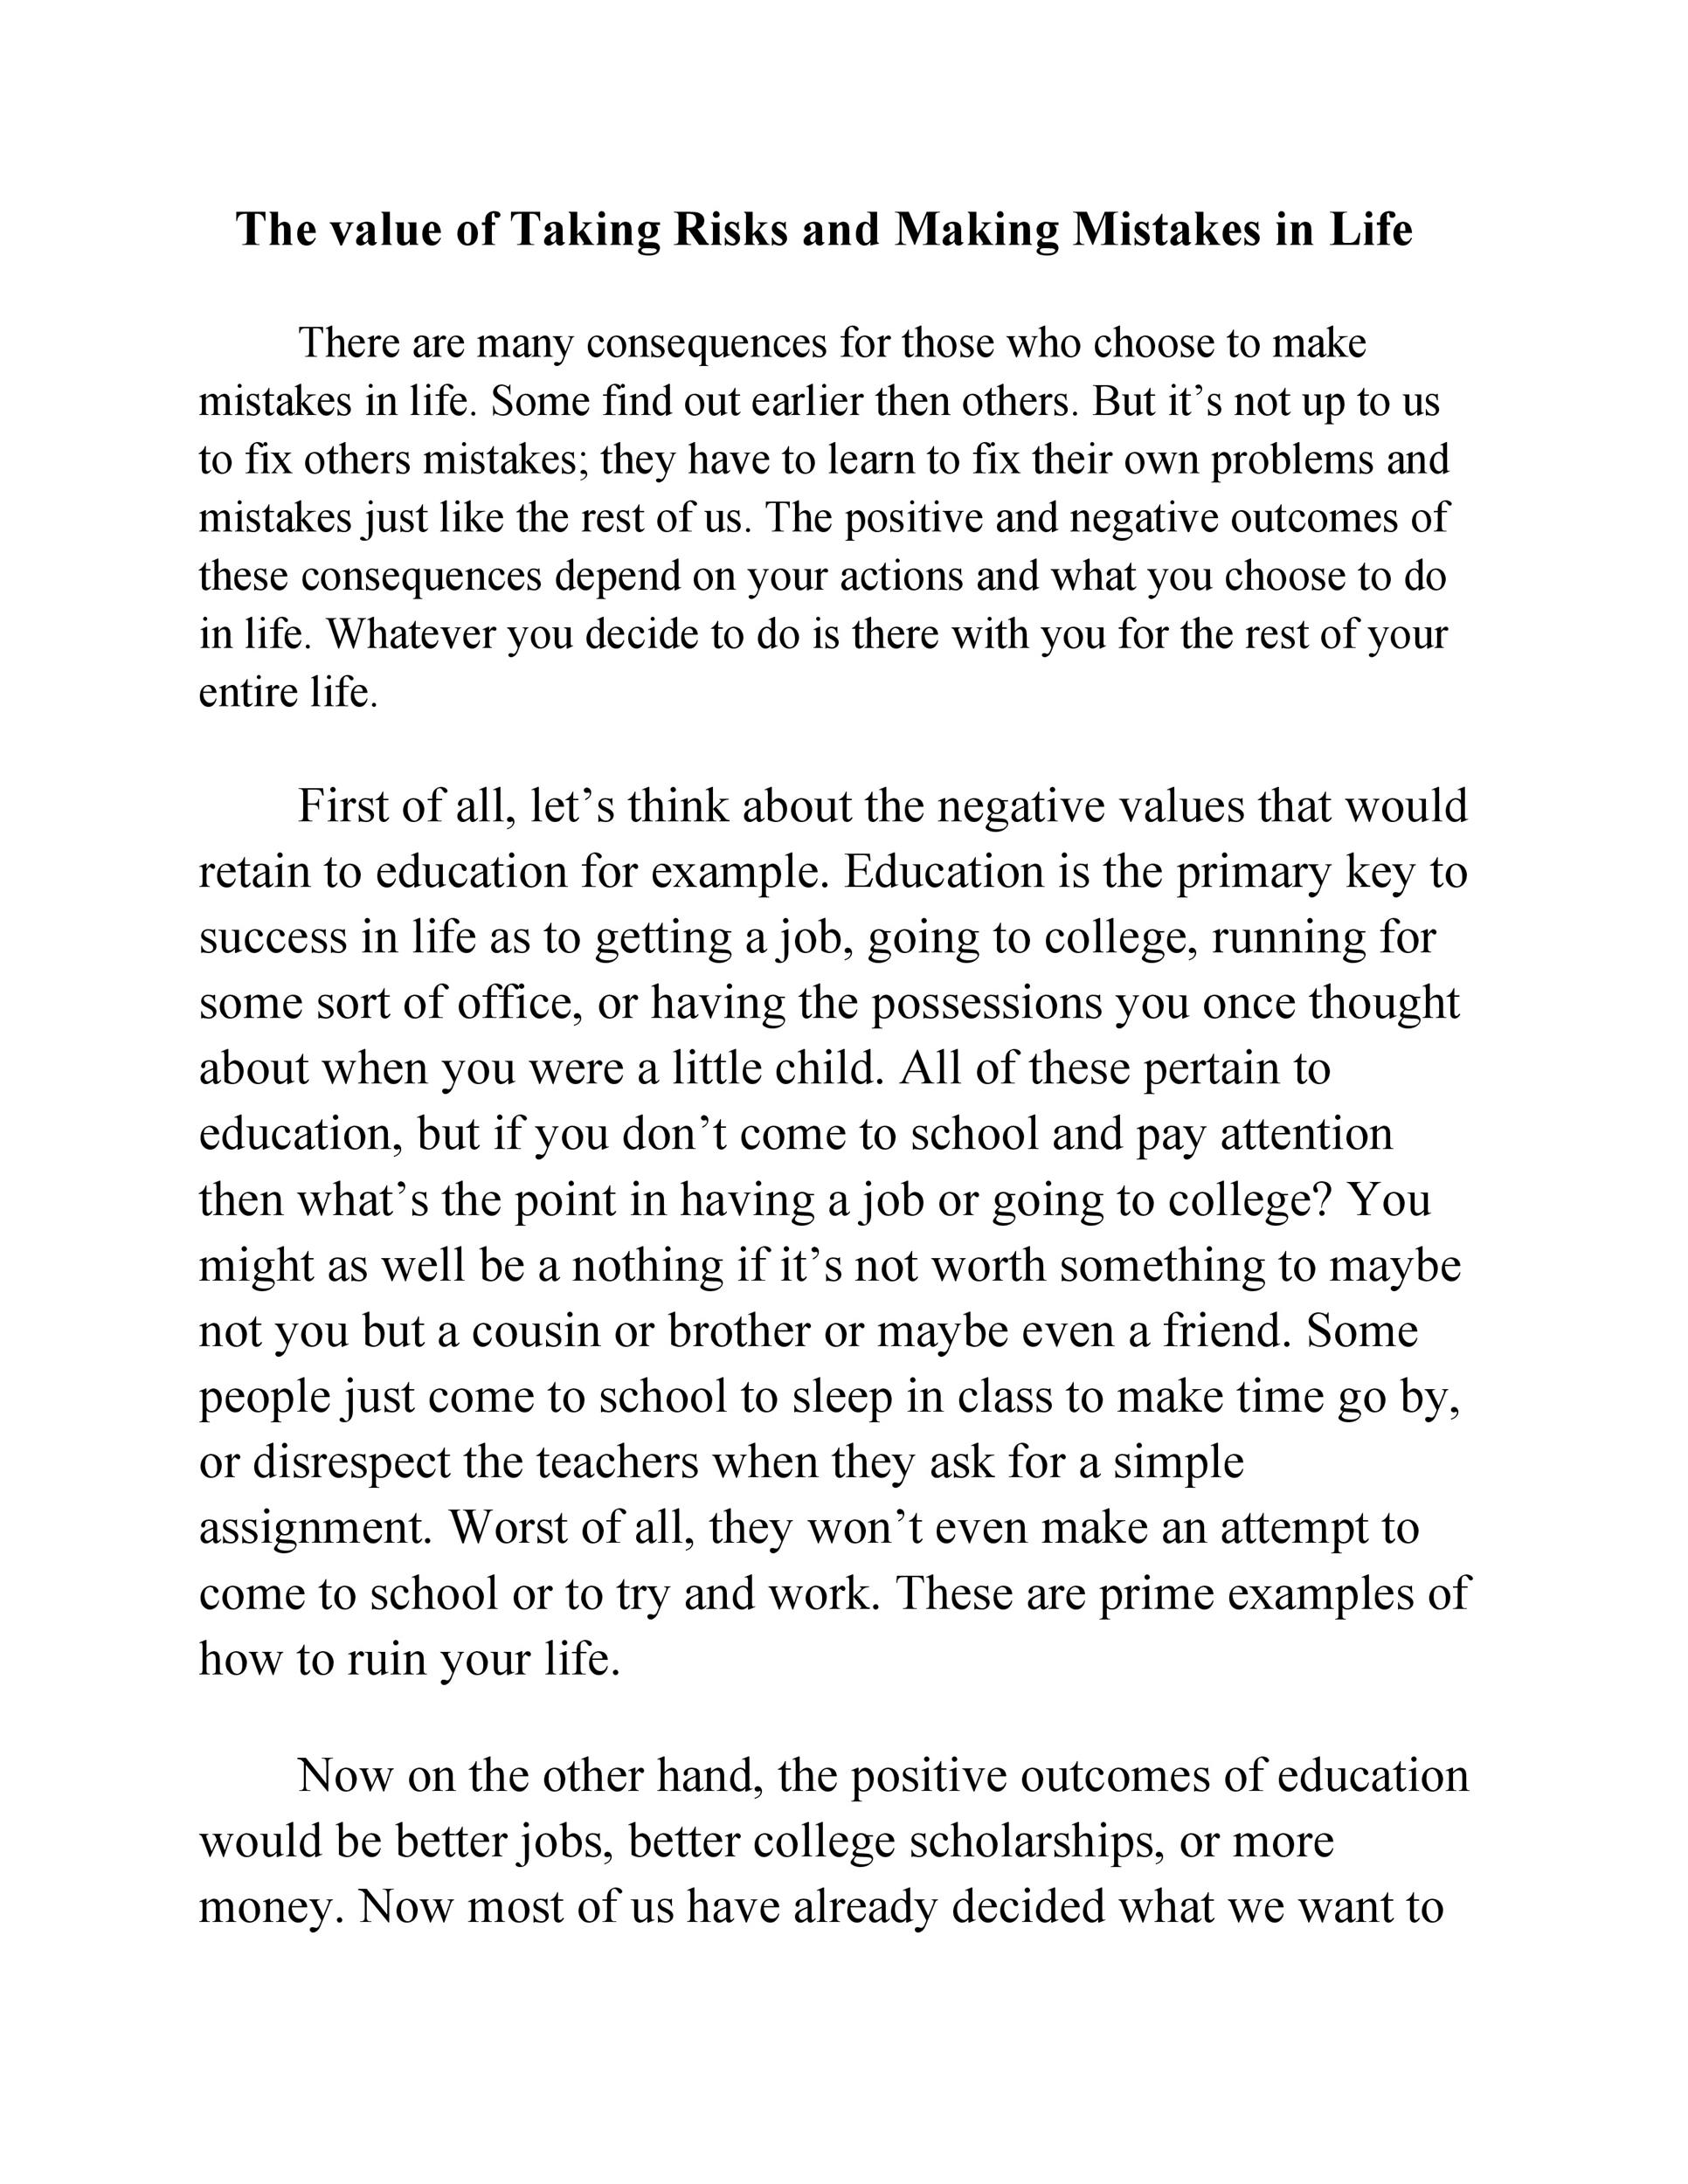 Free persuasive essay example 28